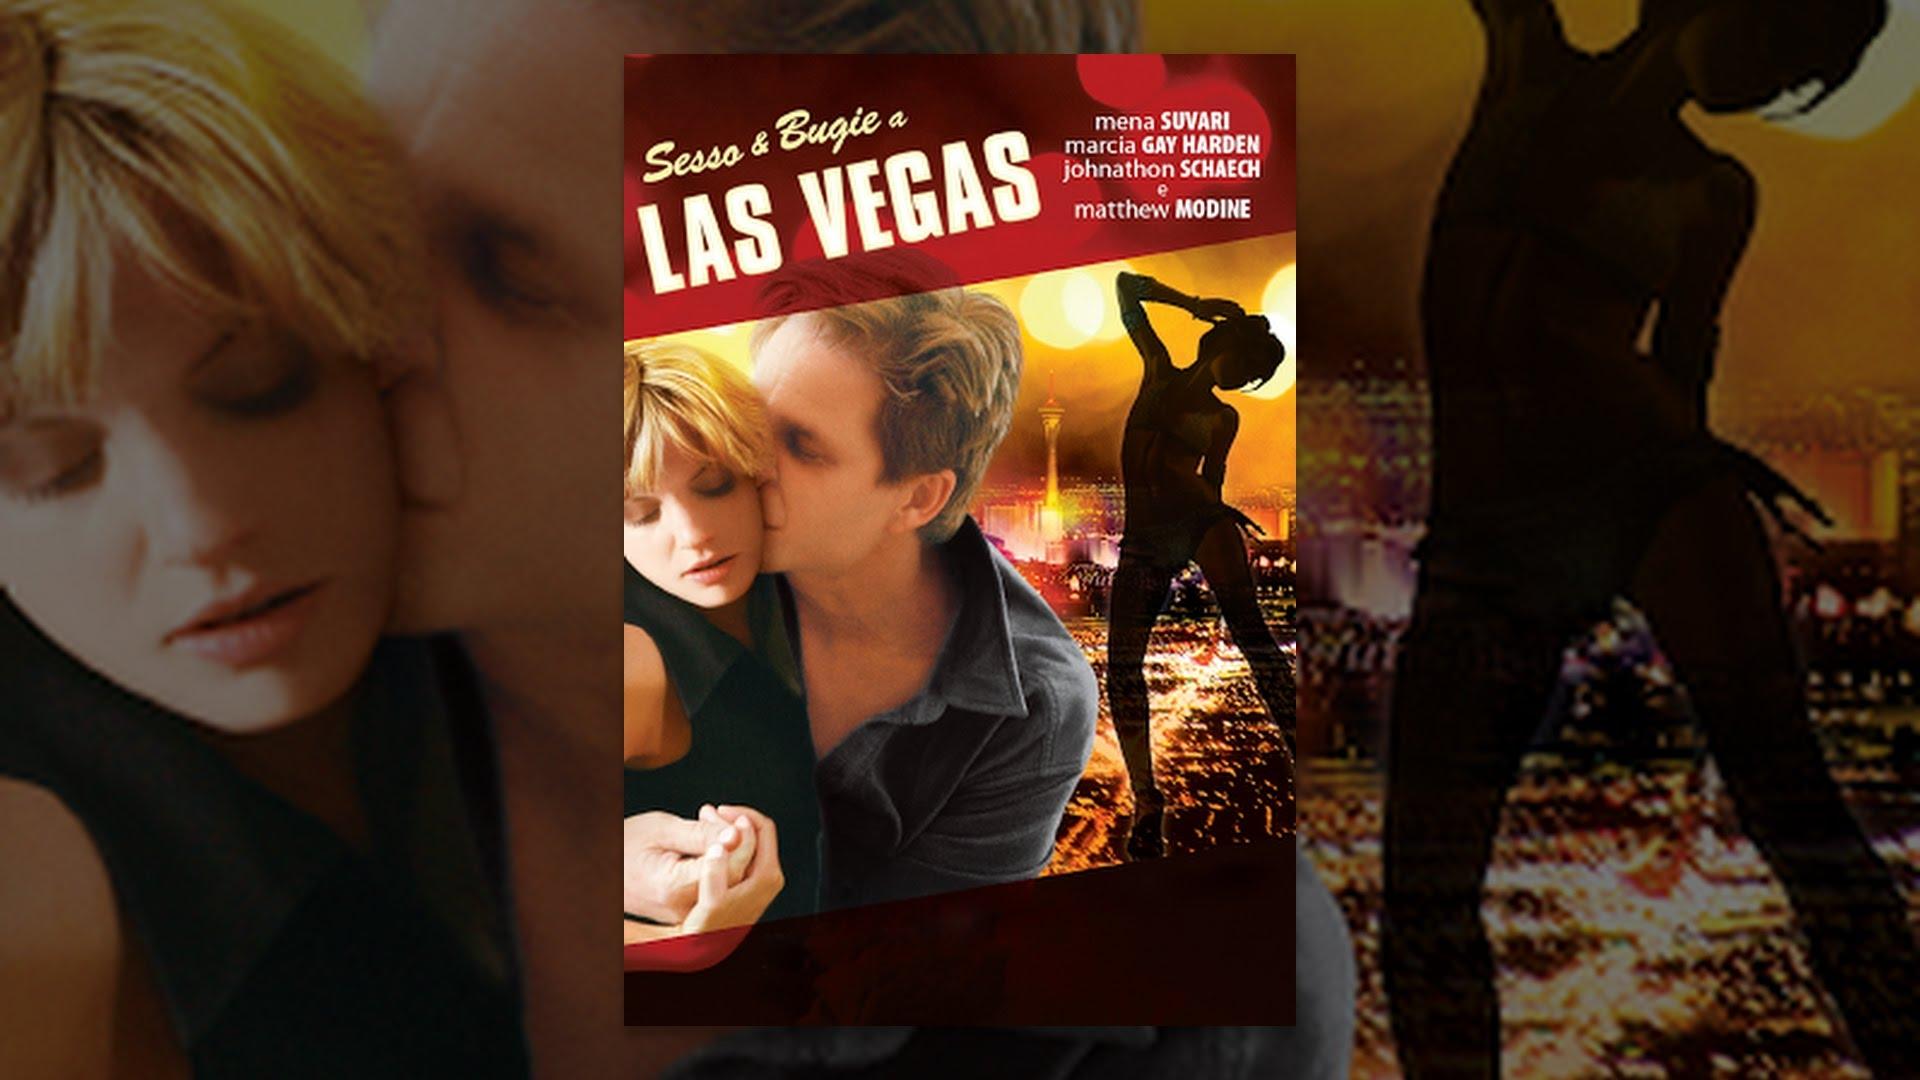 Gay Las Vegas sesso